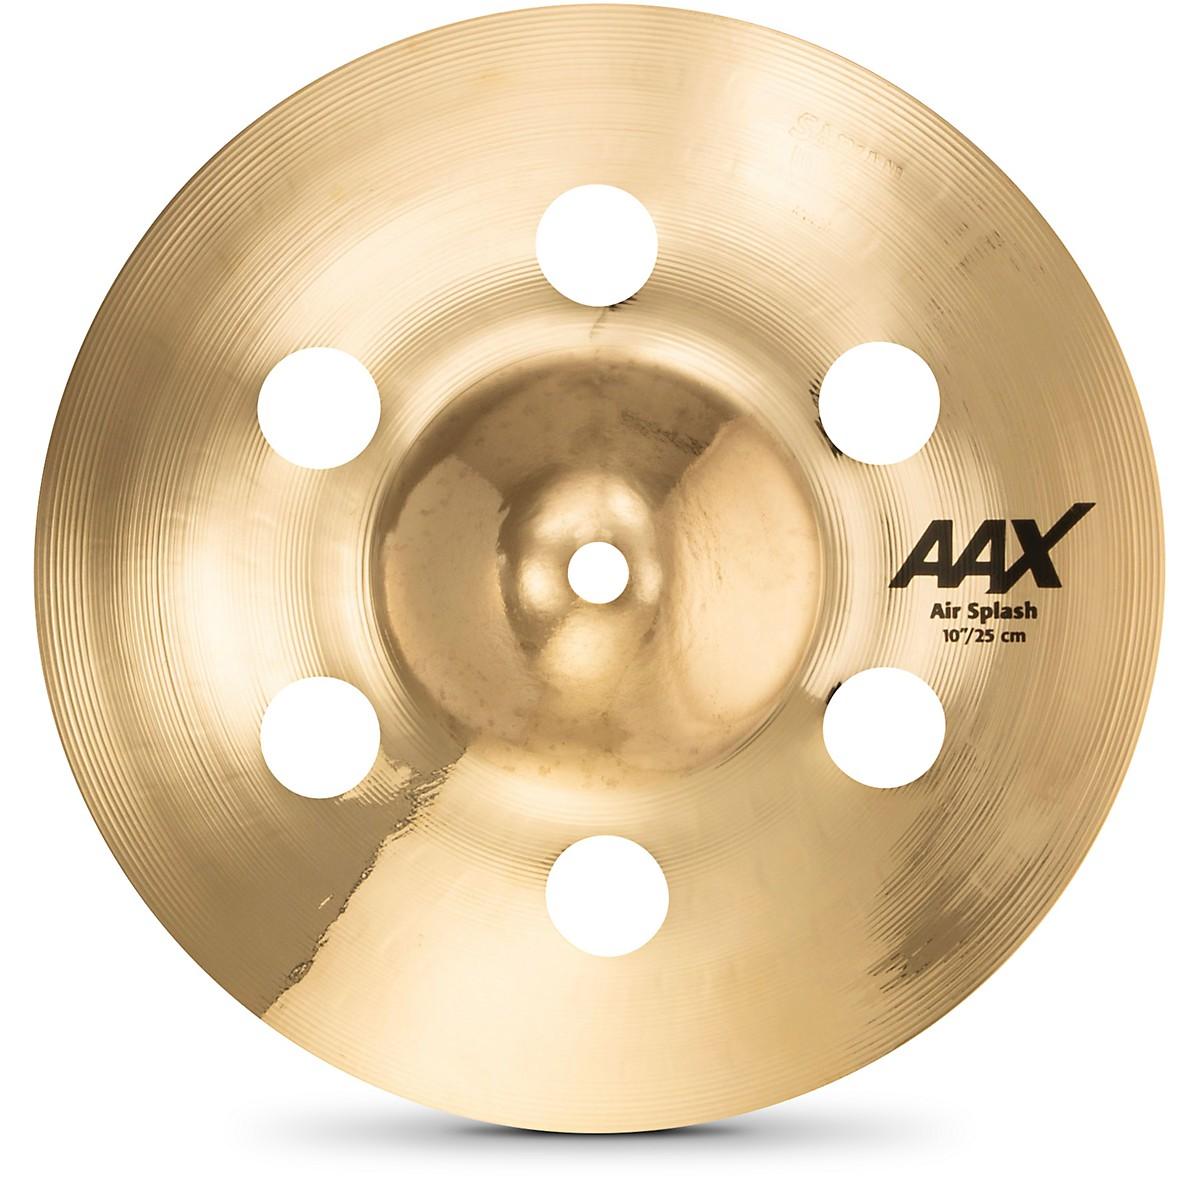 Sabian AAX Air Splash Cymbal Brilliant